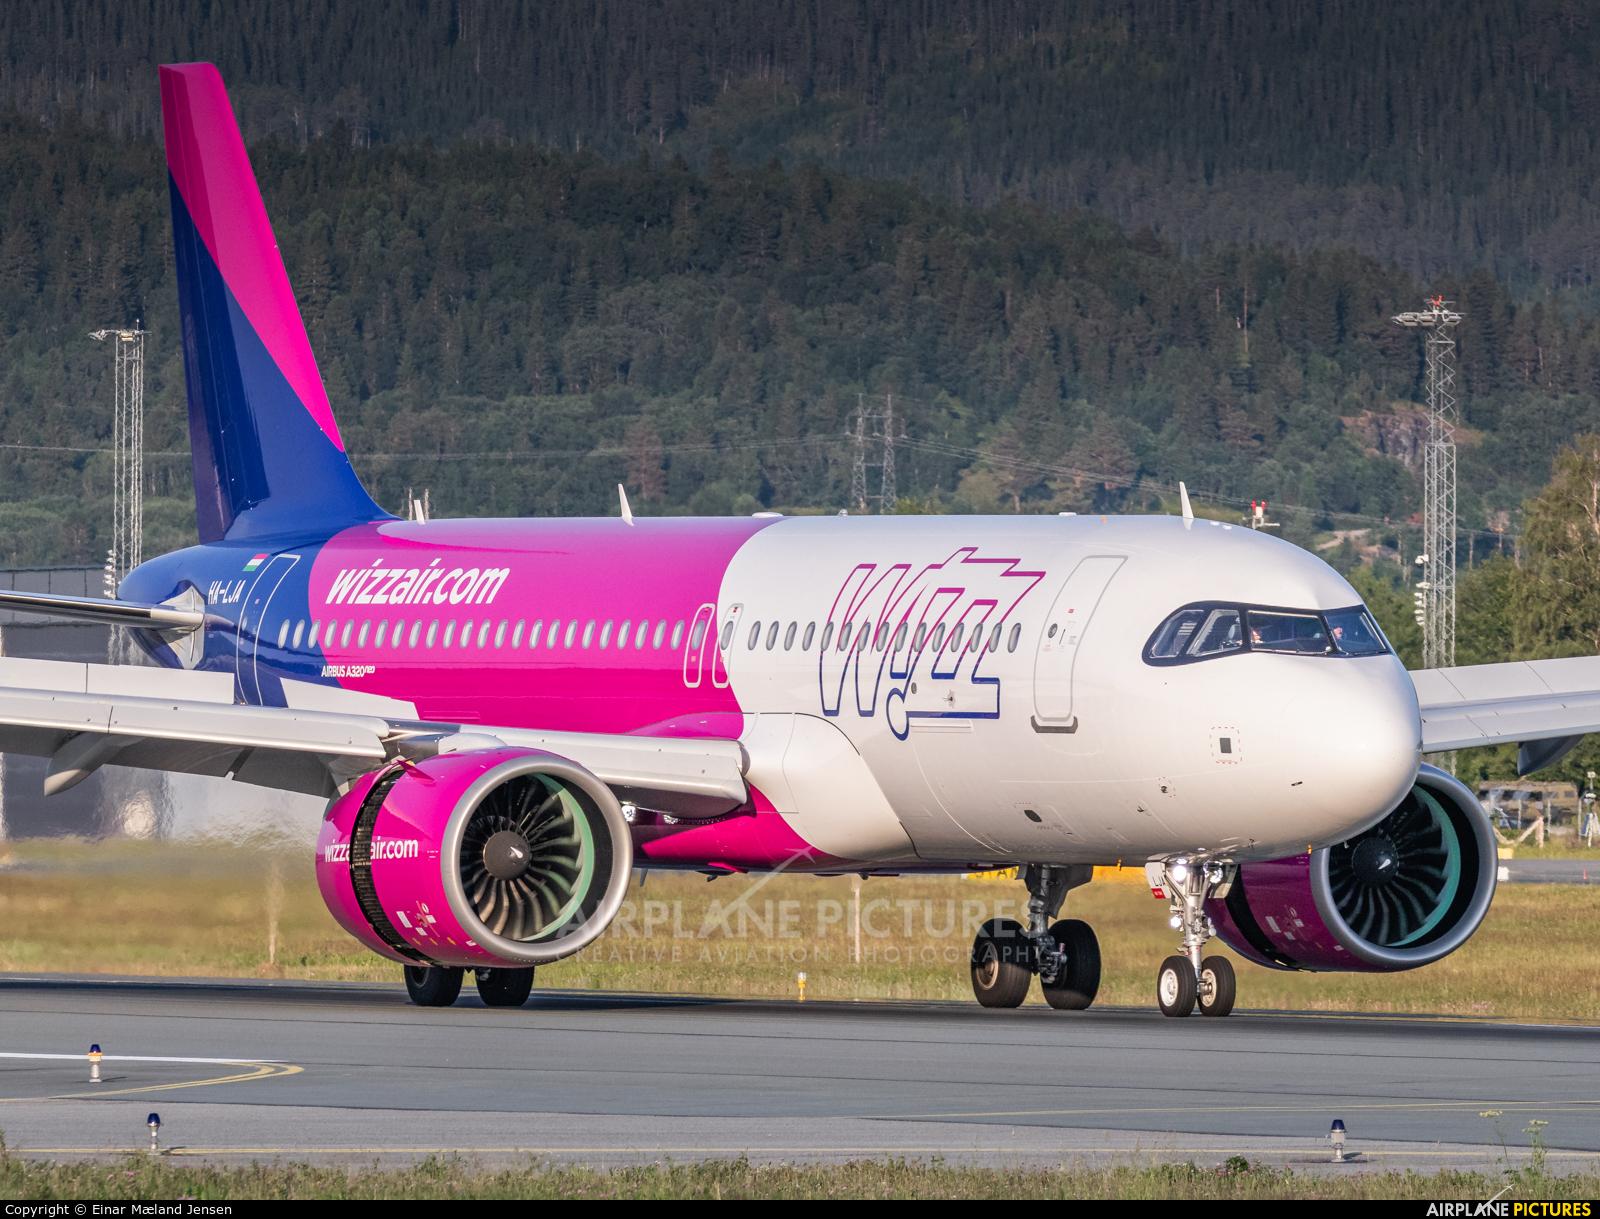 Ha Lja Wizz Air Airbus A320 Neo At Trondheim Vaernes Photo Id 1328921 Airplane Pictures Net